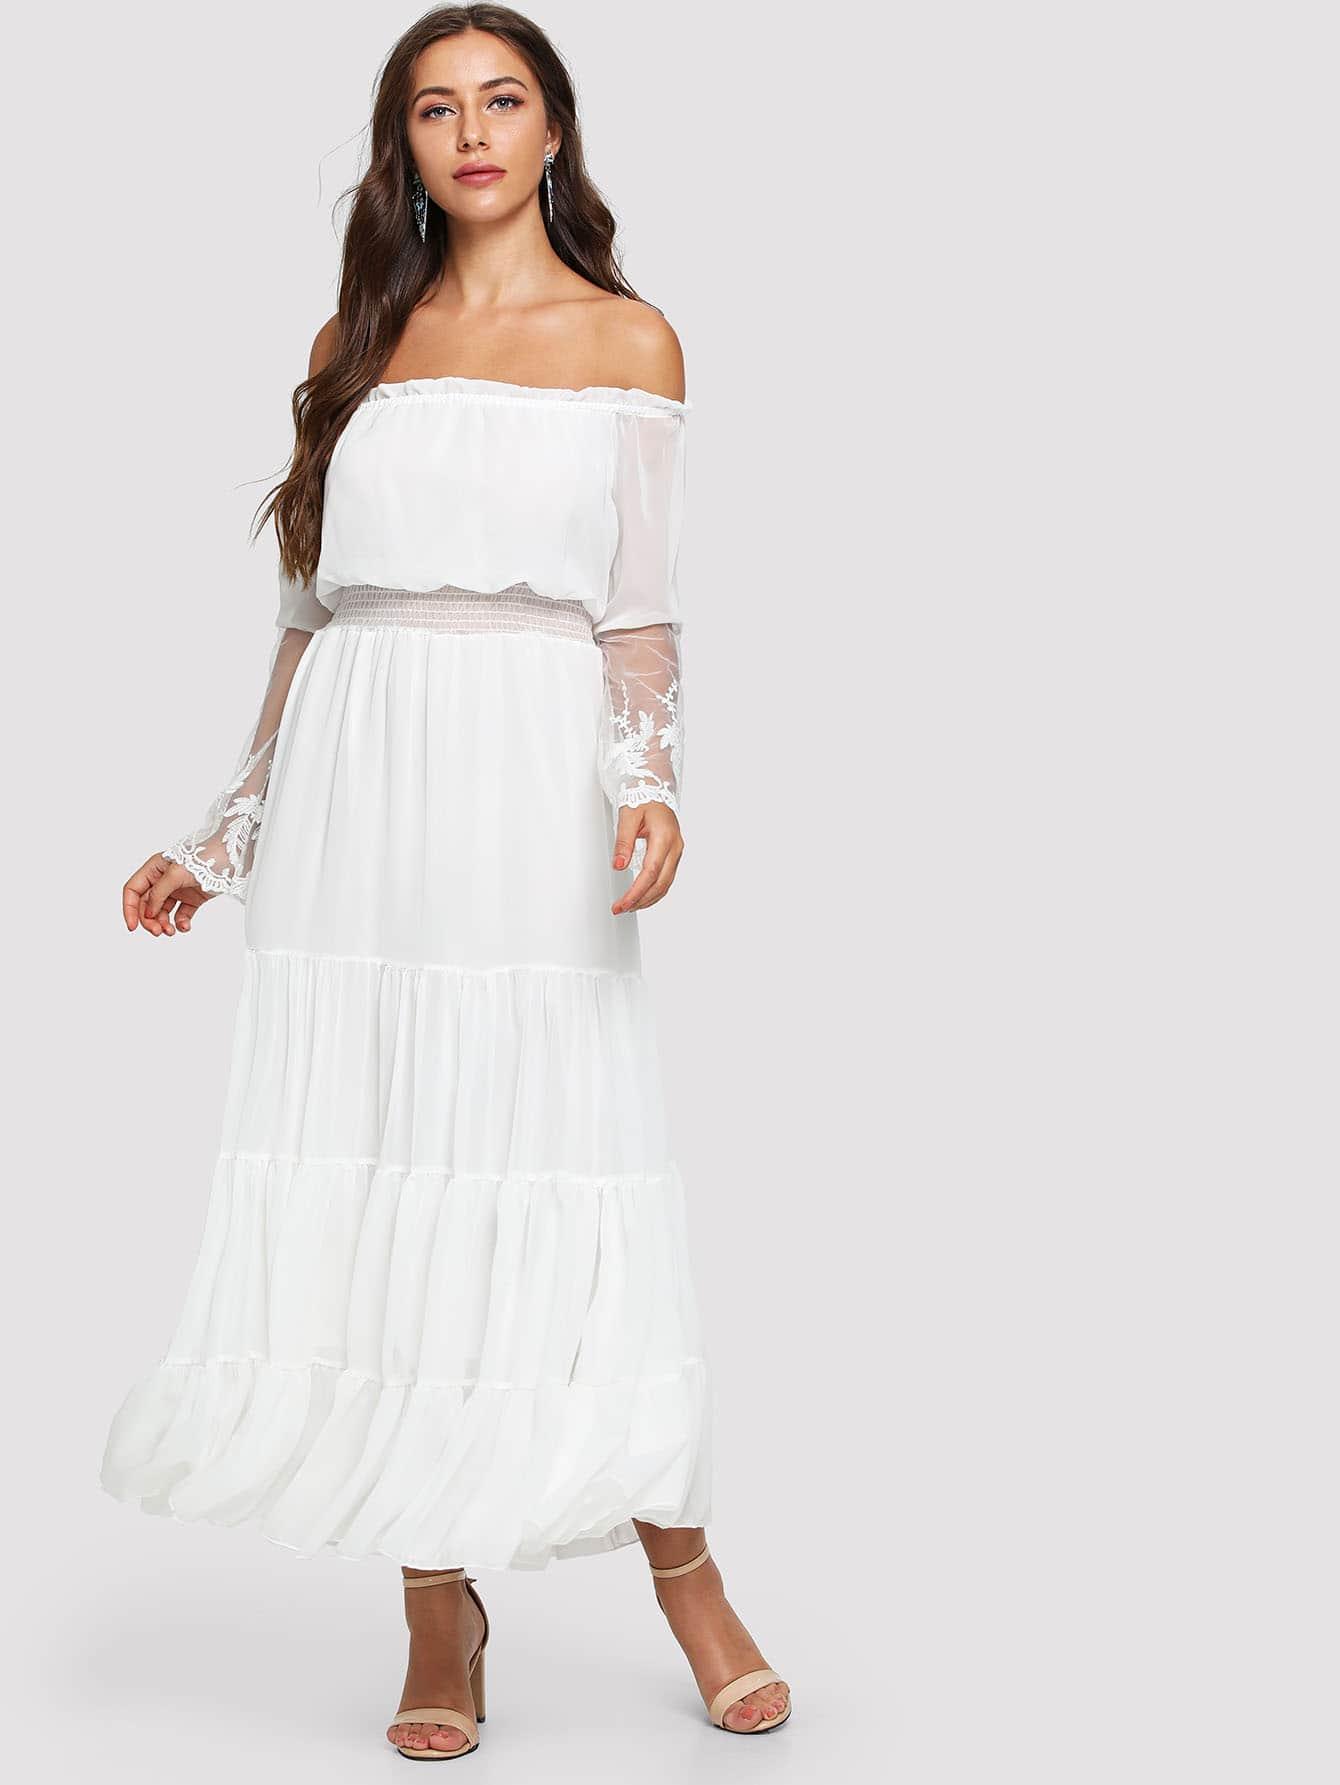 Off-Shoulder Lace Contrast Ruffle Dress lace off shoulder dress